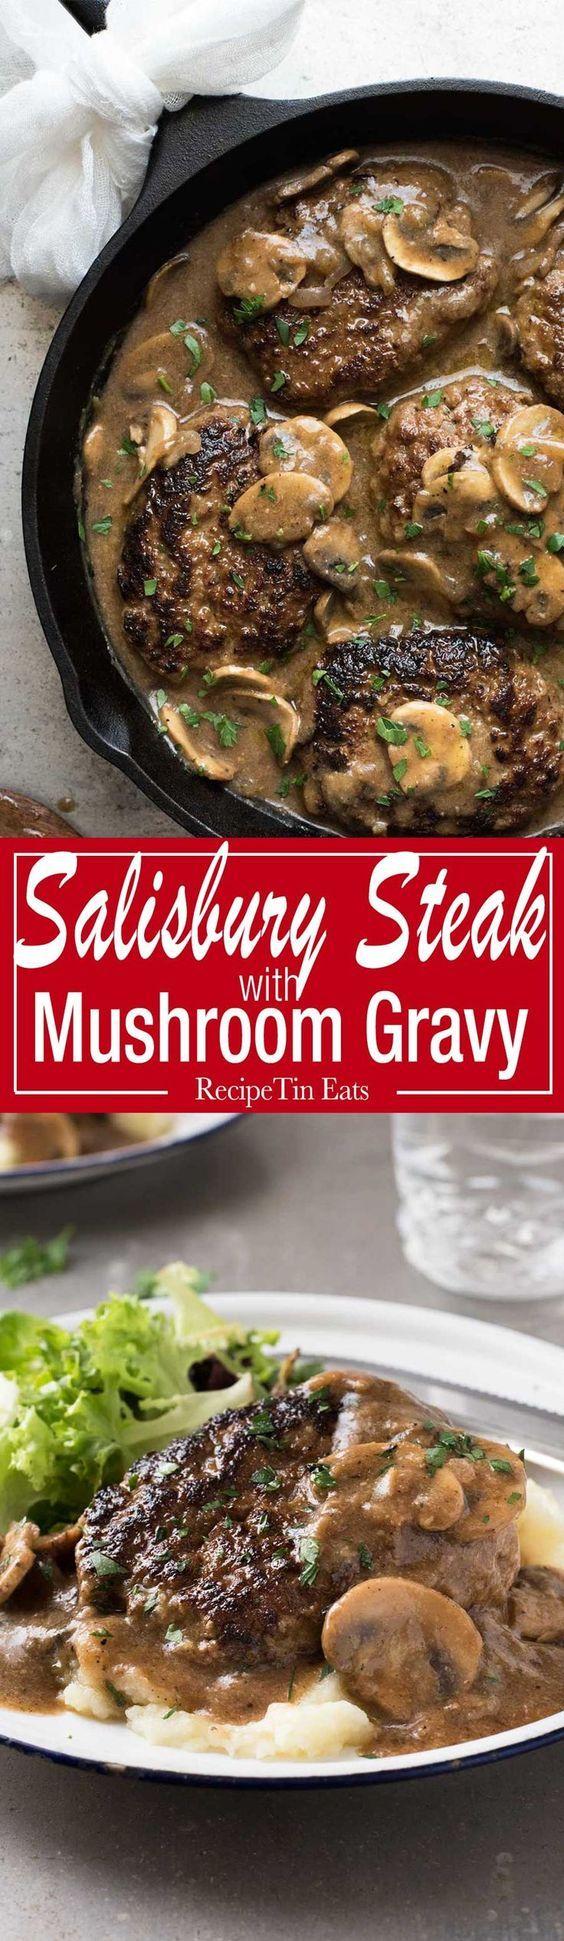 A juicy Salisbury Steak recipe with Mushroom Gravy Salisbury Steak Sauce. Easy to make with a restaurant trick for an extra tasty gravy!